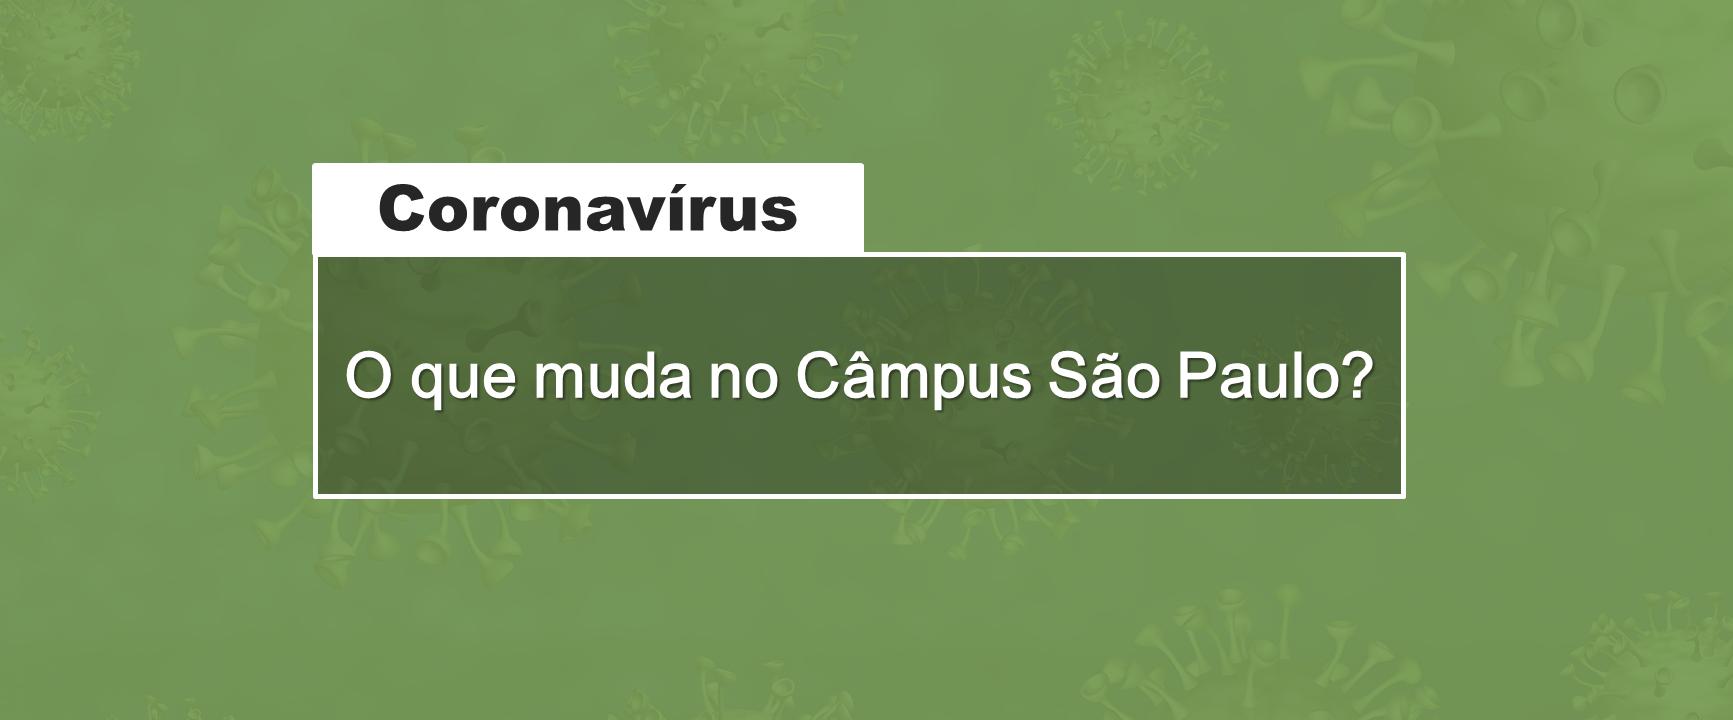 Coronavírus (Covid-19): O que muda no Câmpus São Paulo?